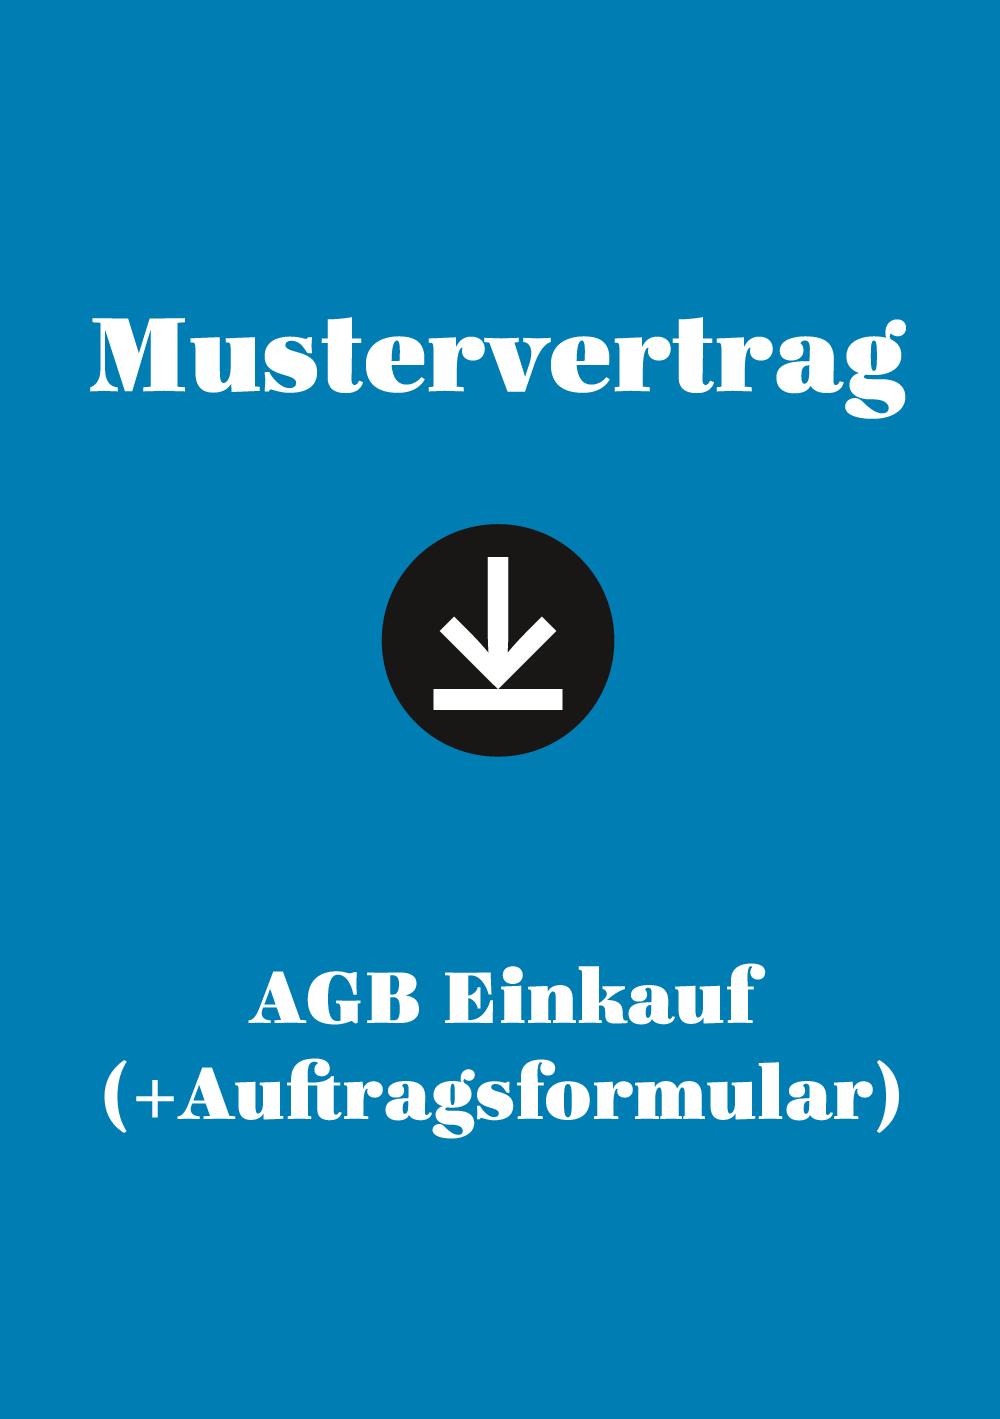 Produkt: Mustervertrag: AGB Einkauf (+ Auftragsformular)